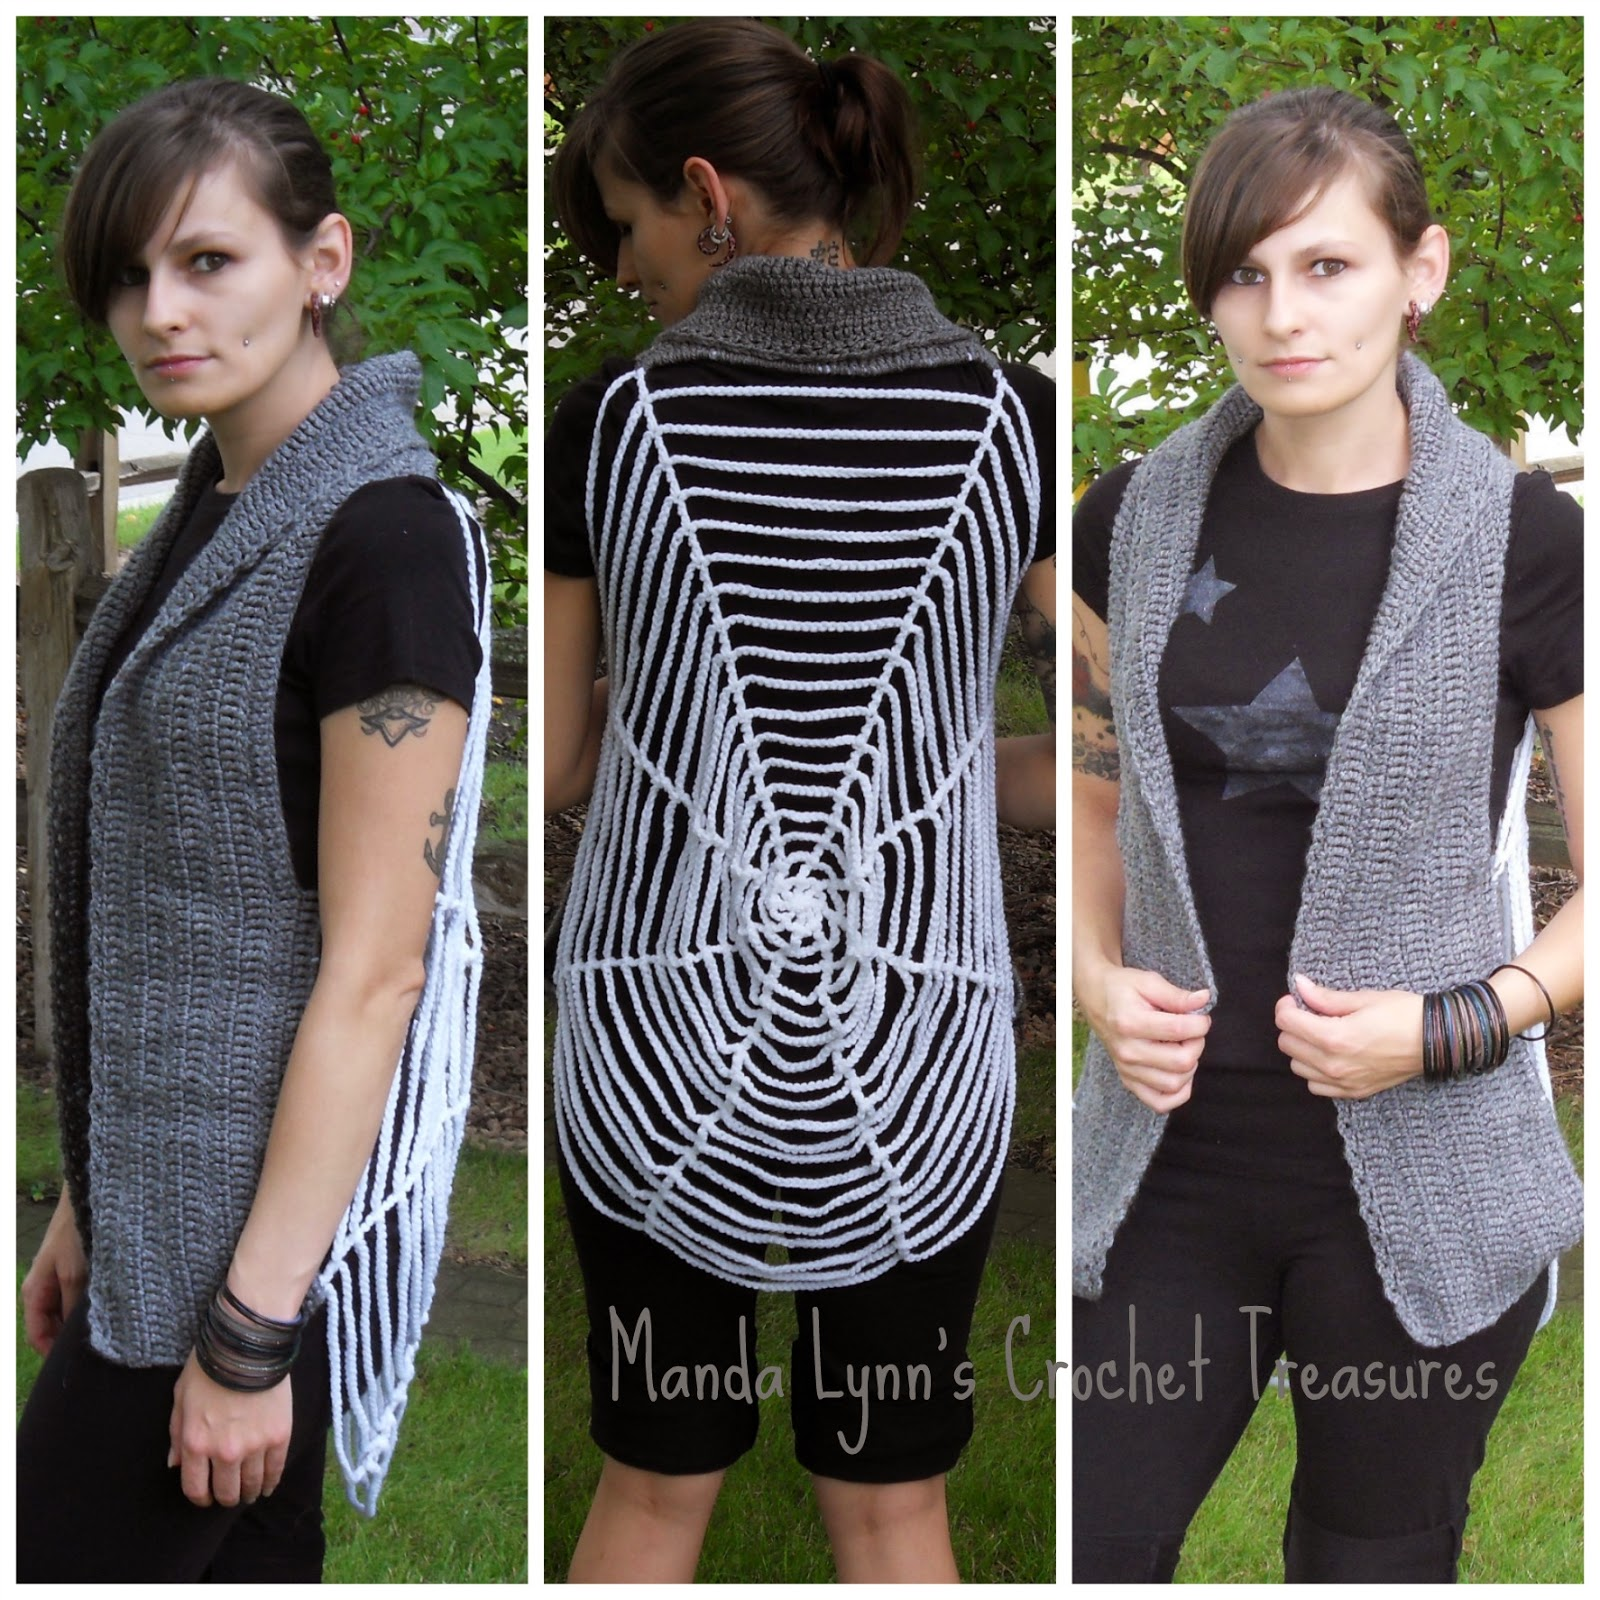 Spiderweb Vest ~ Manda Proell - MandaLynn's Crochet Treasures